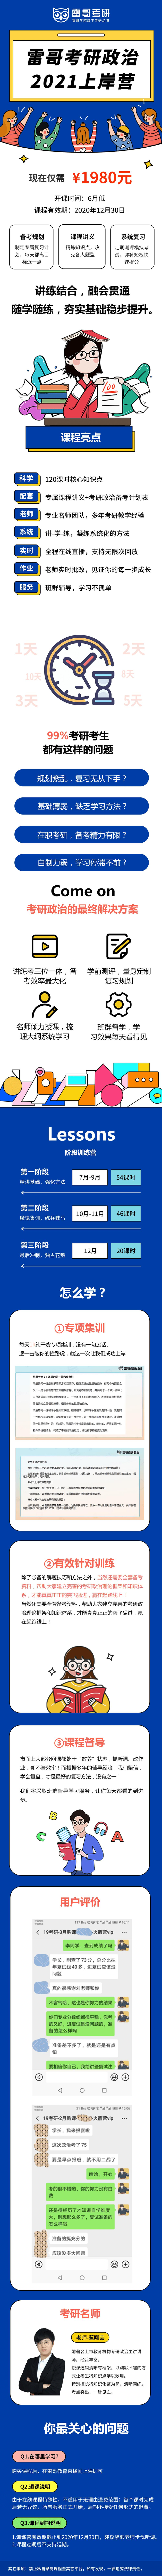 政治(上岸)6.5.png